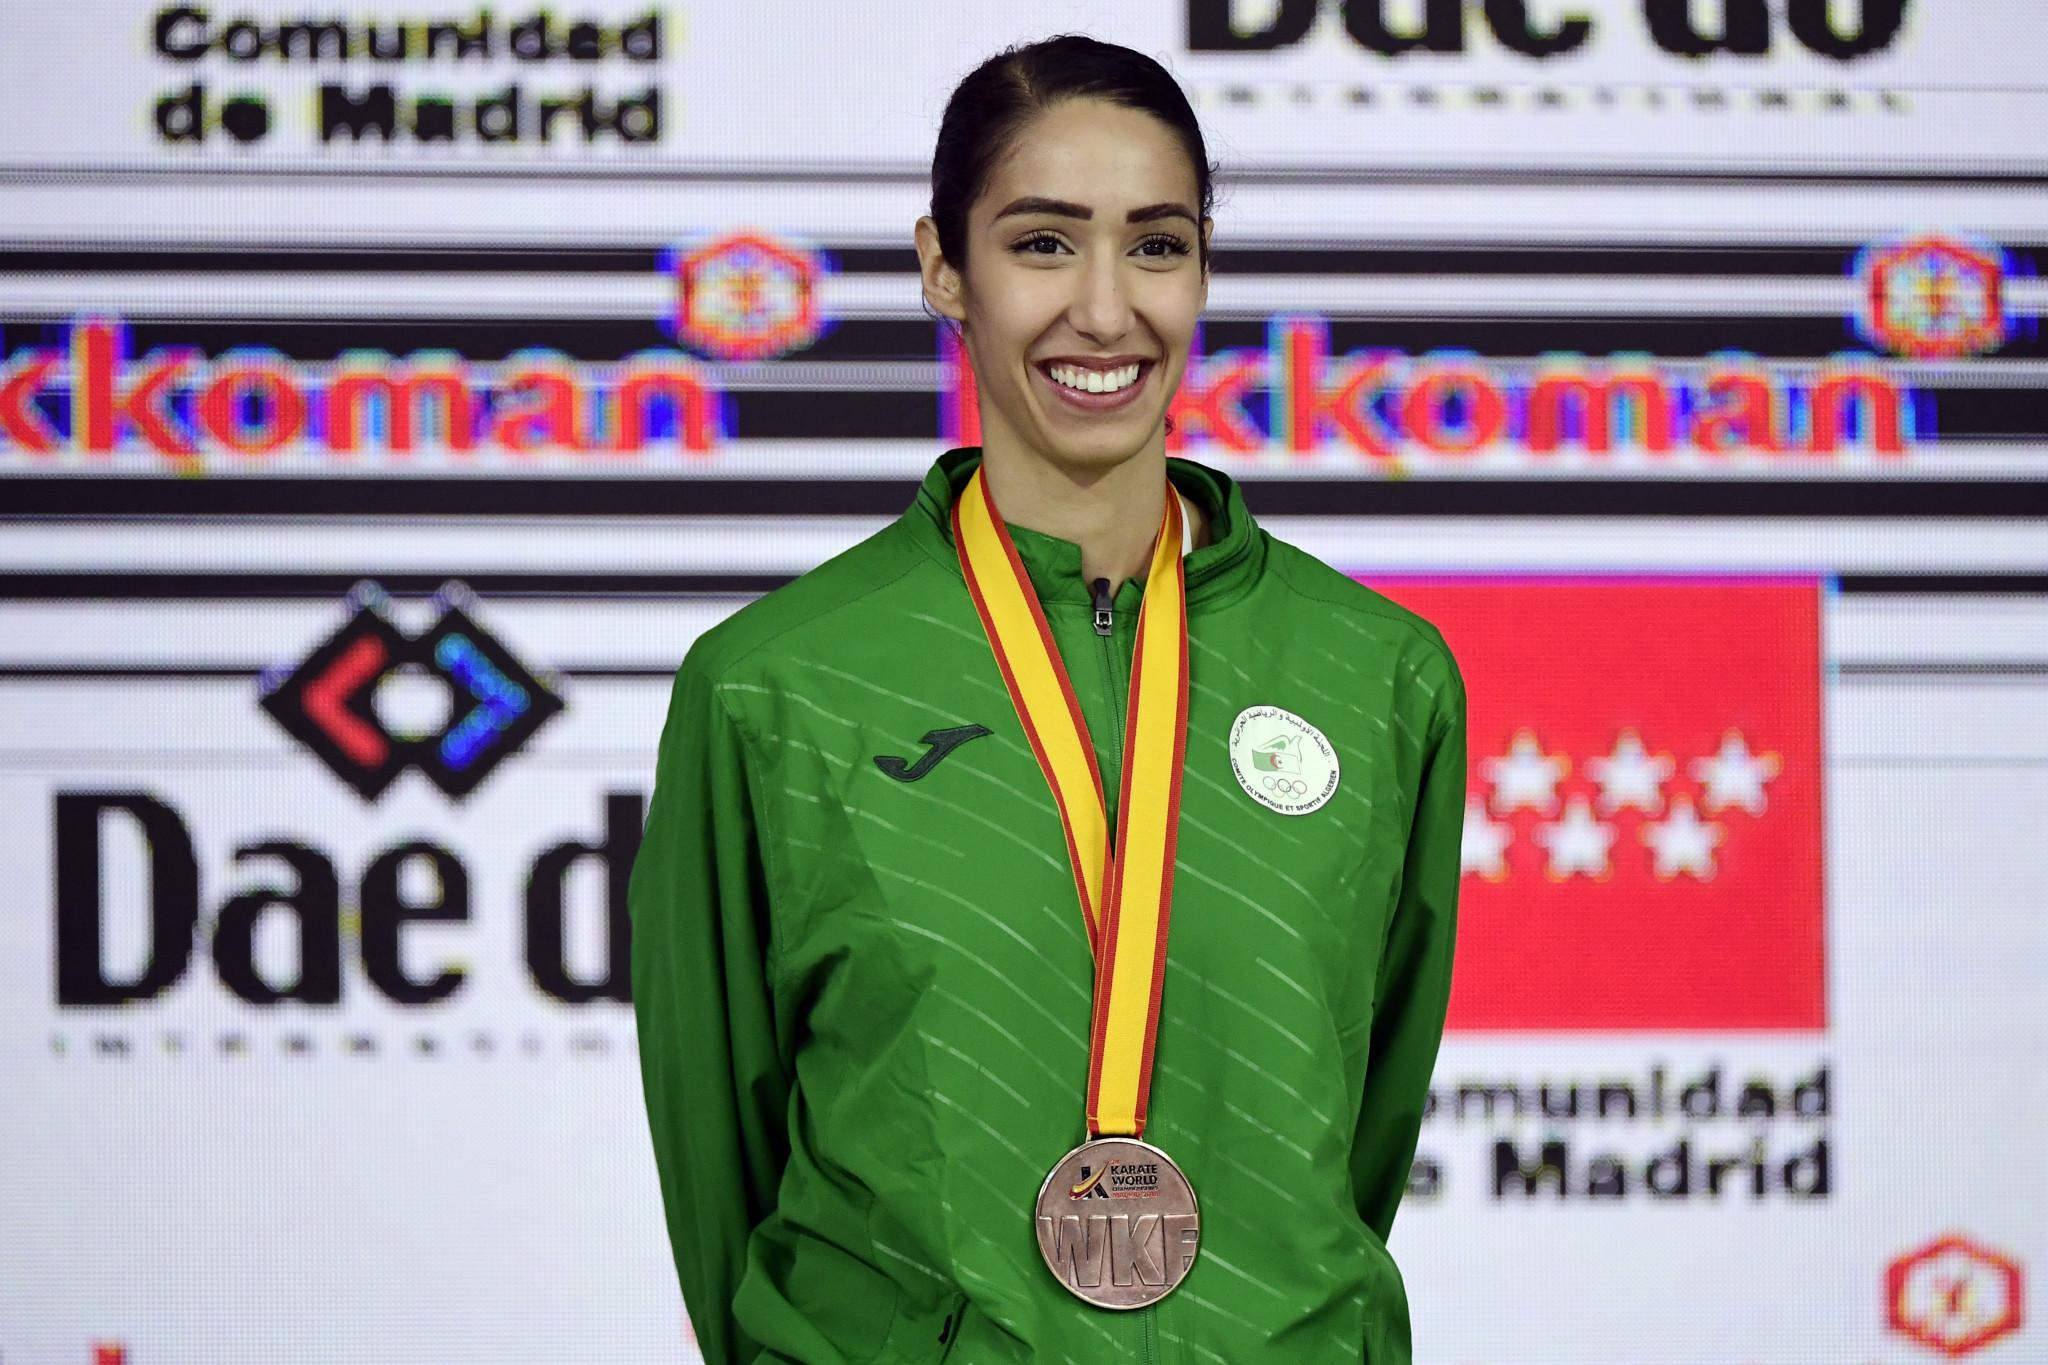 World Championship bronze medallist  Lamya Matoub won the women's award ©Getty Images